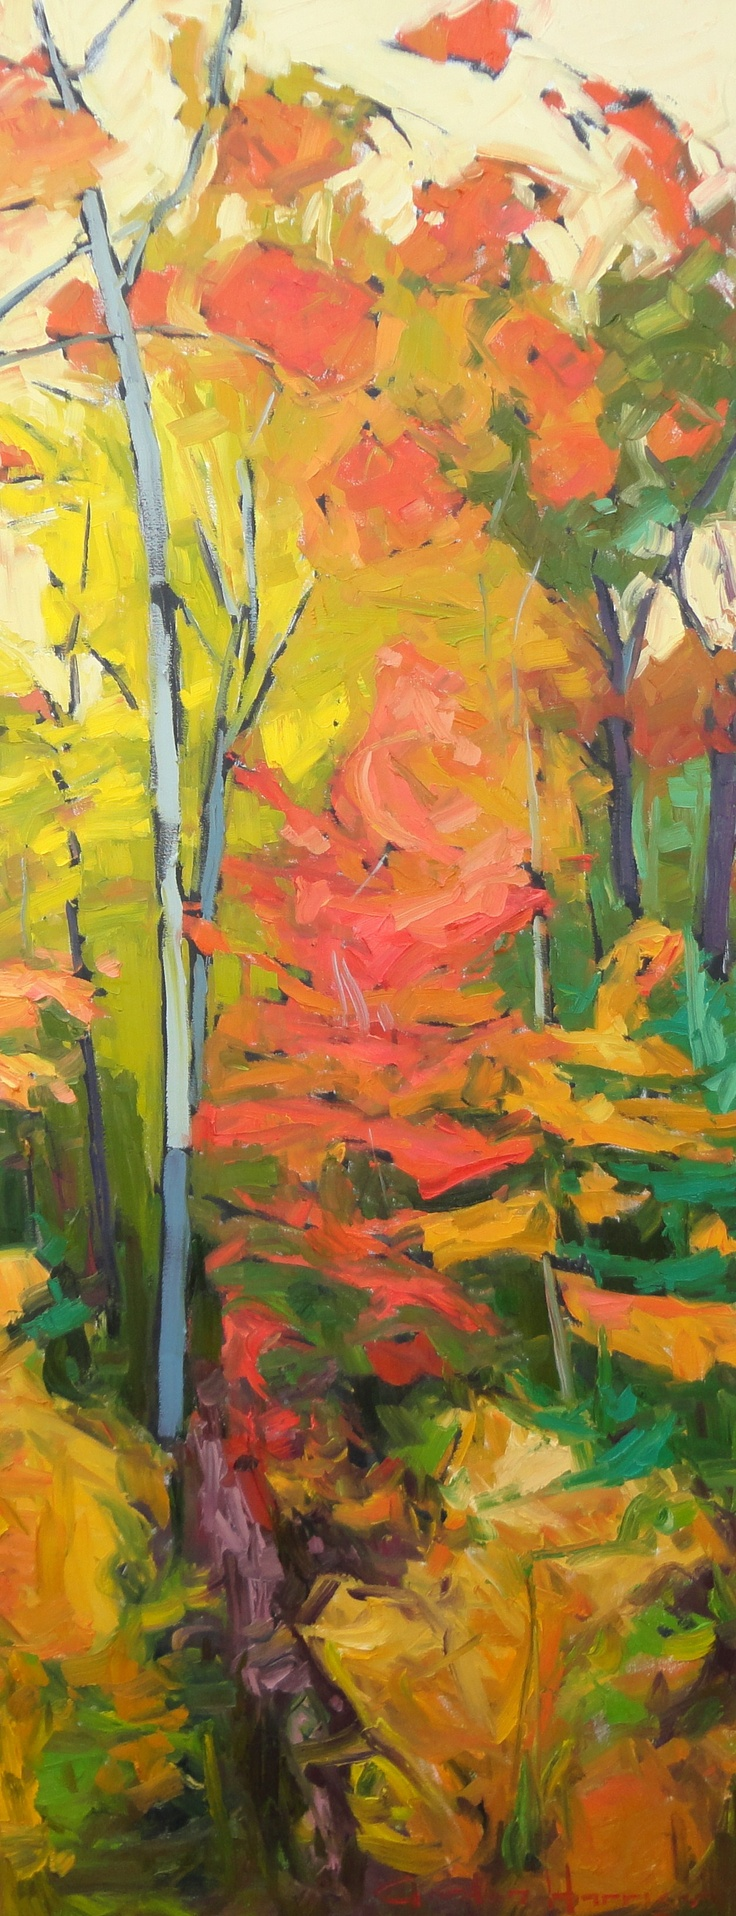 Gordon Harrison Gallery - Gordon Harrison